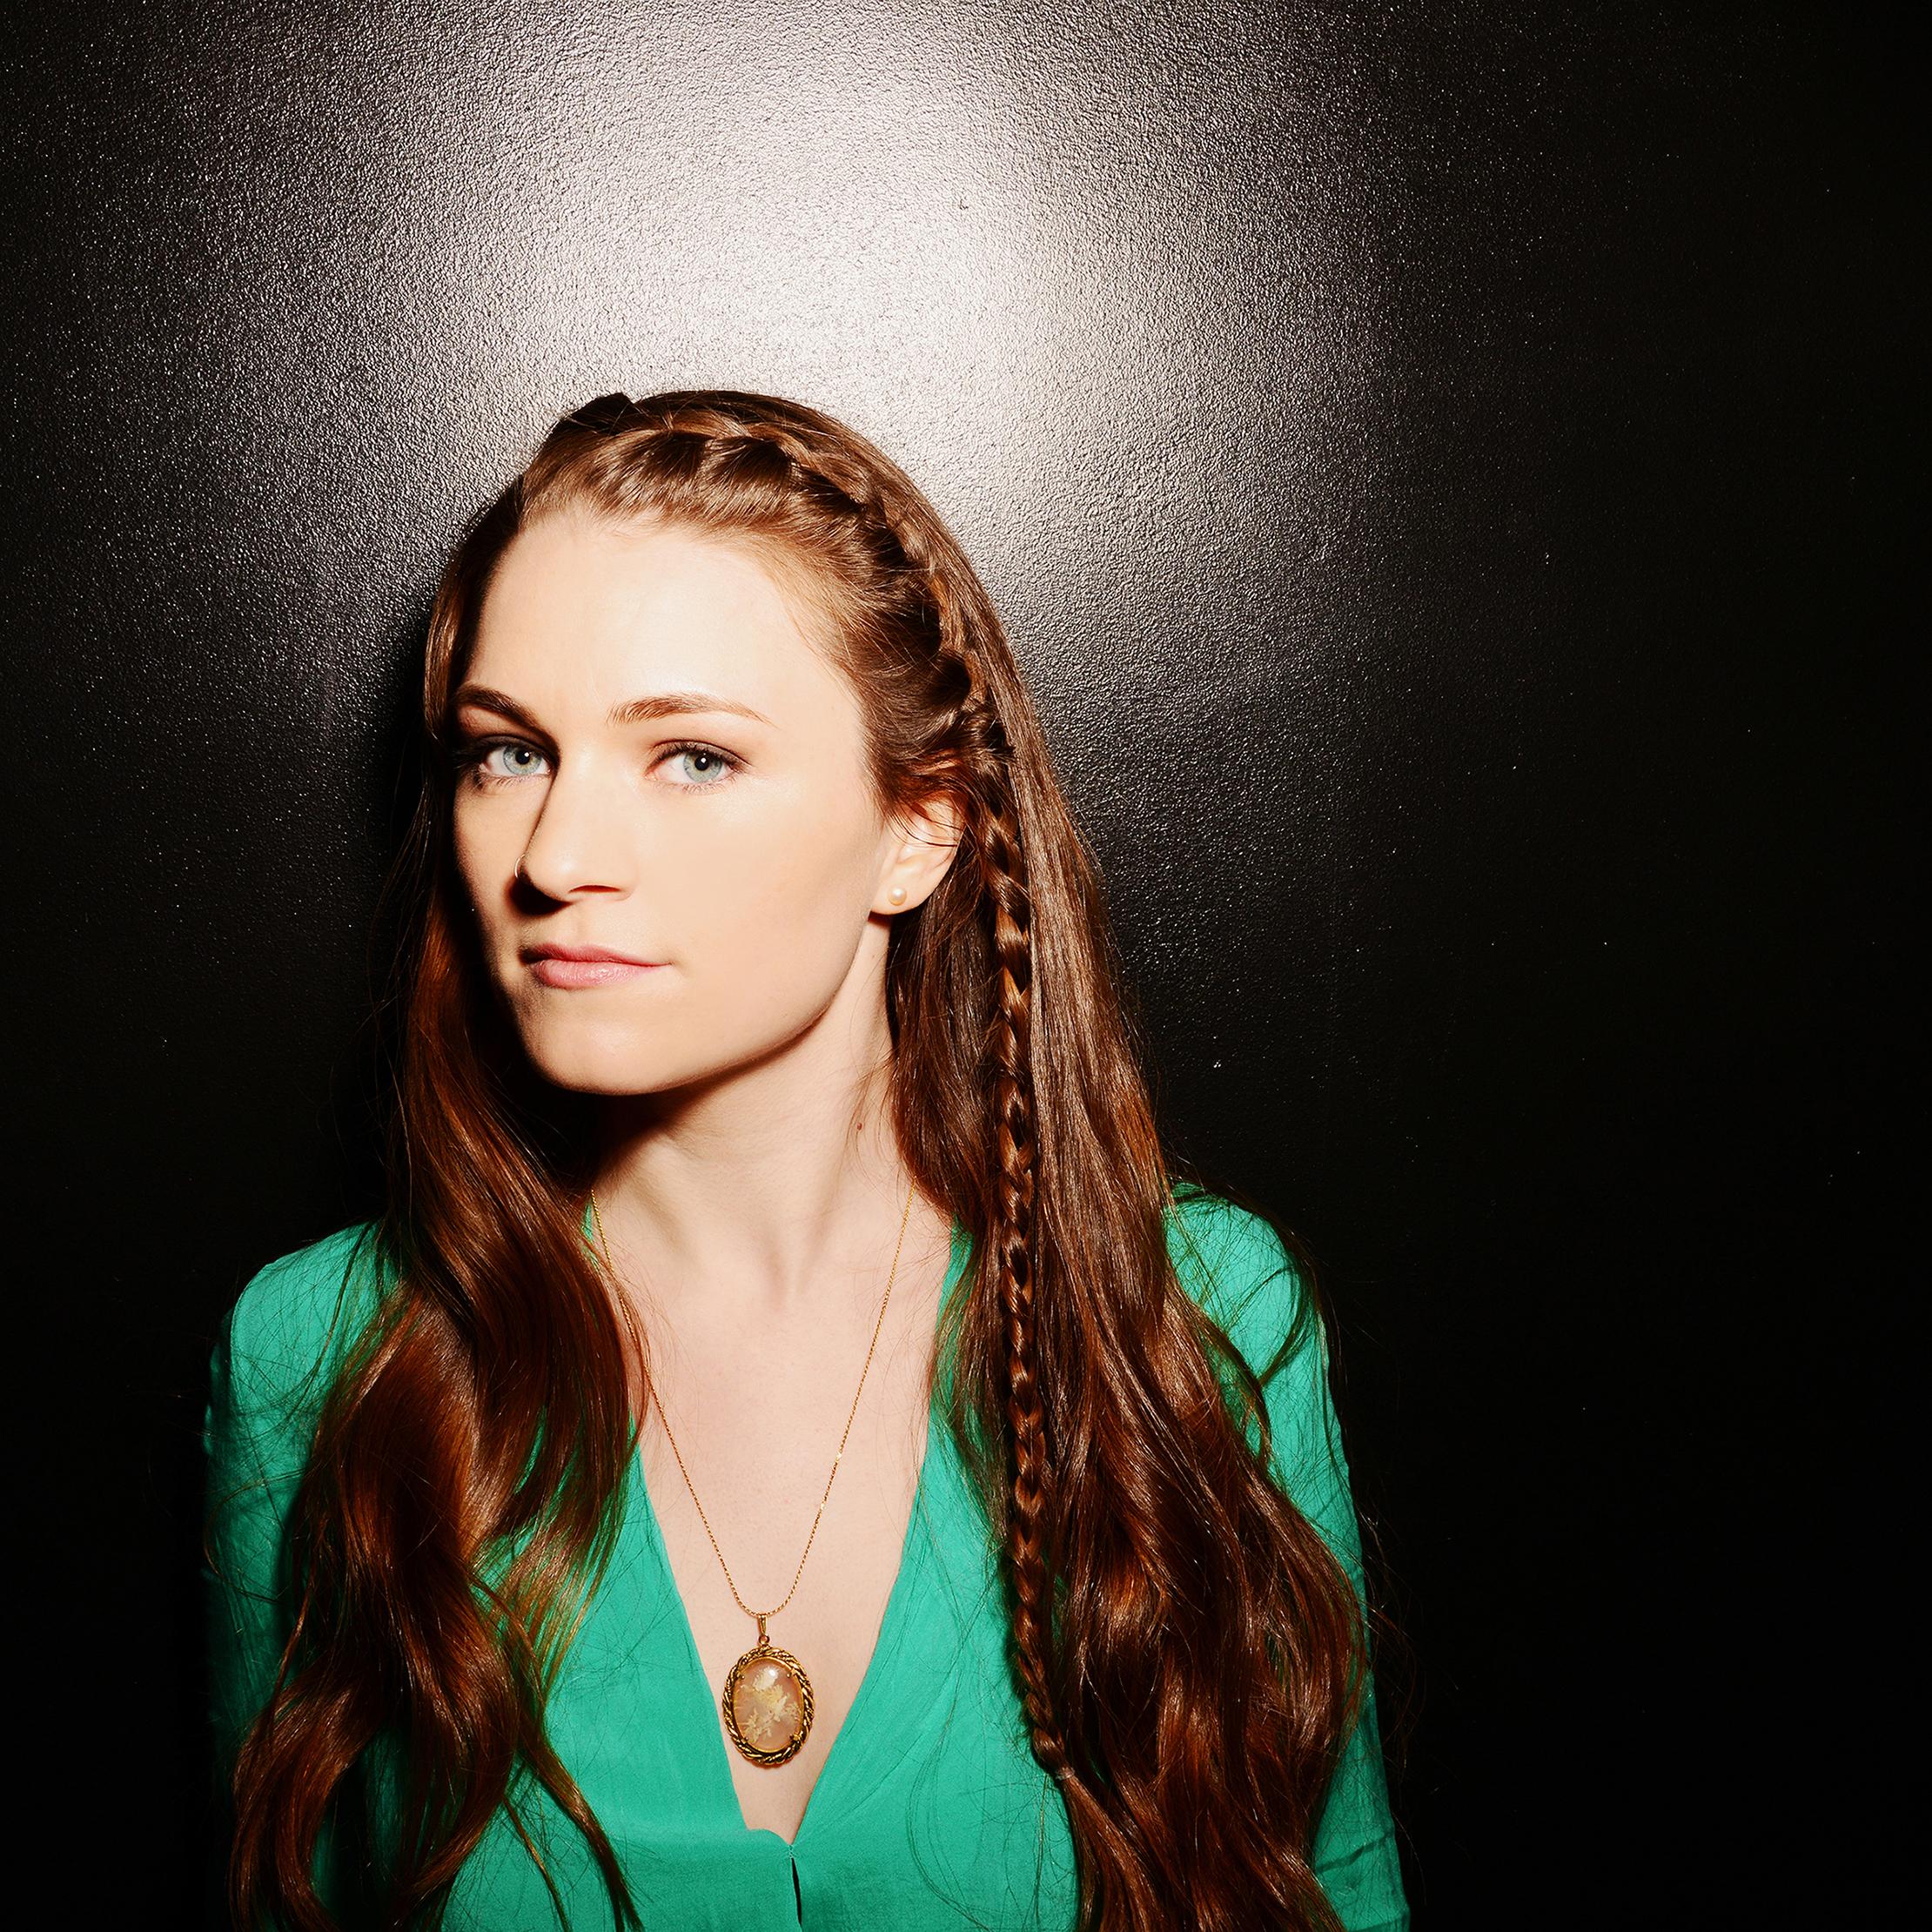 Caili O'doherty - Promo Photo 4